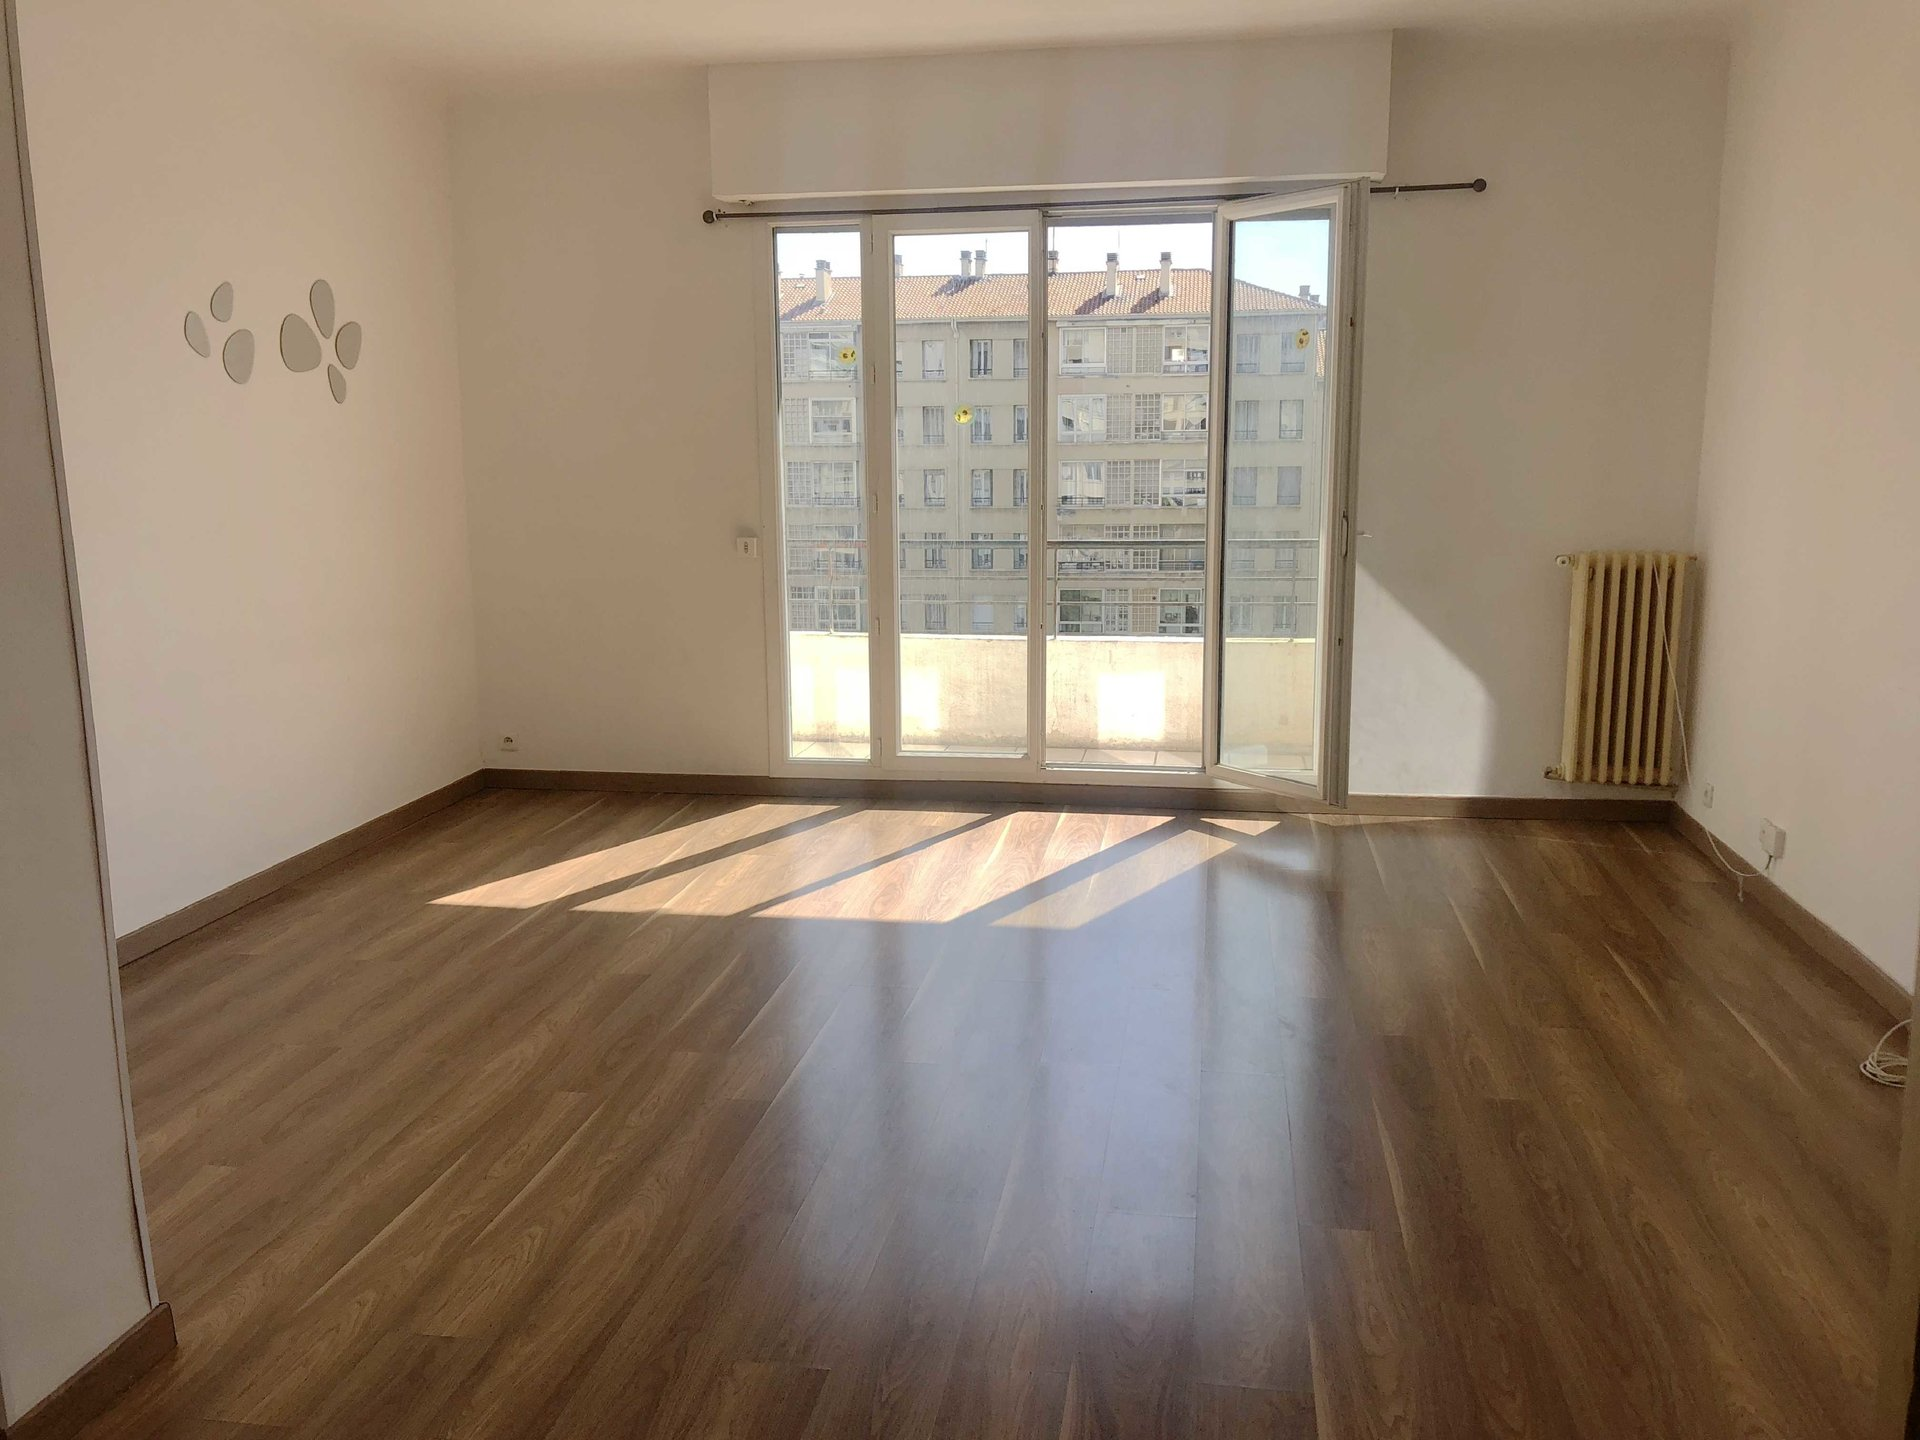 EXCLUSIVITE Vente Appartement de Type 4 Square Michelet 13009